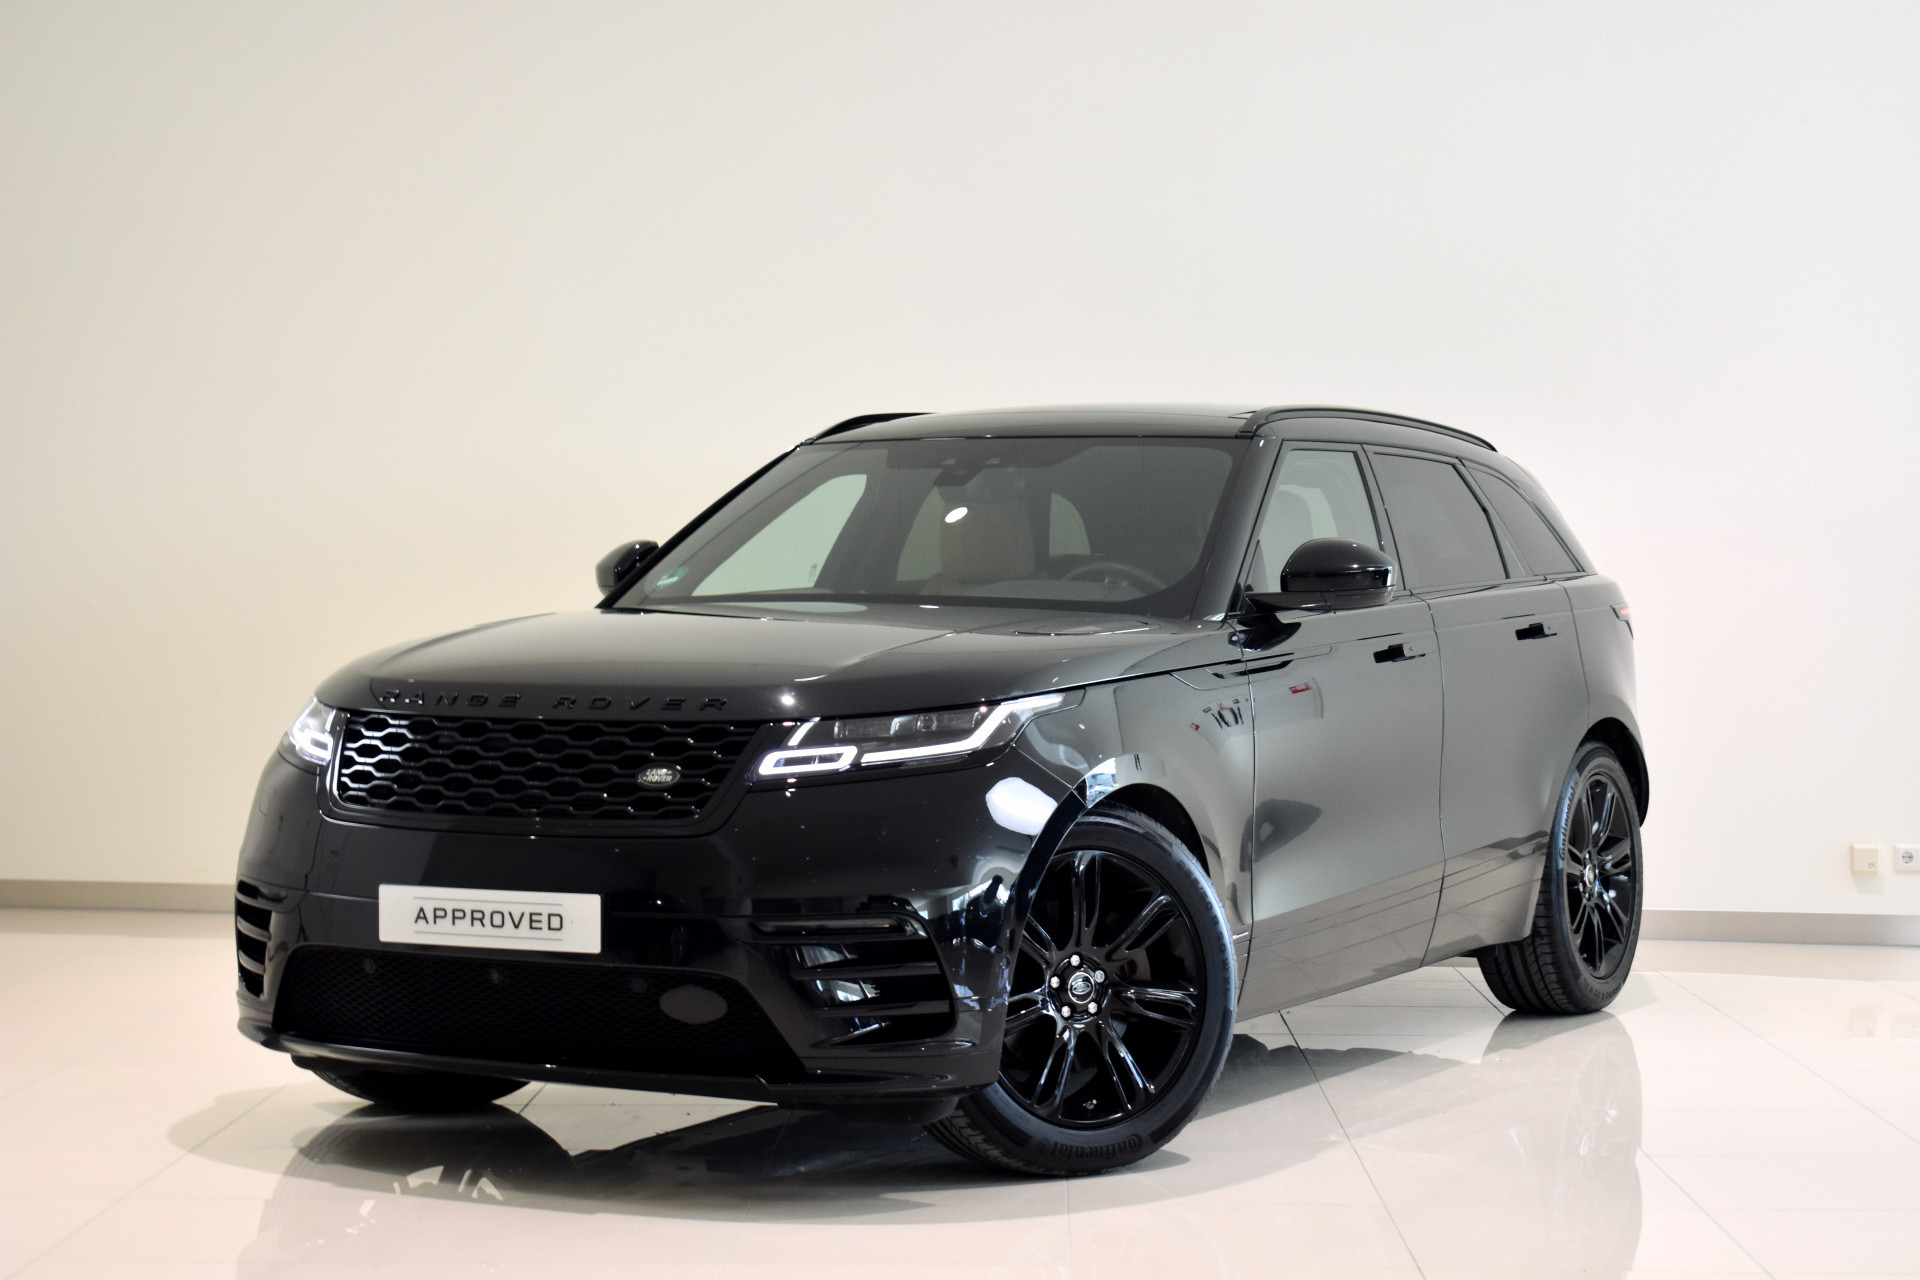 Land Rover Range Rover Velar 3.0 D300 AWD R-Dynamic HSE - Afbeelding 1